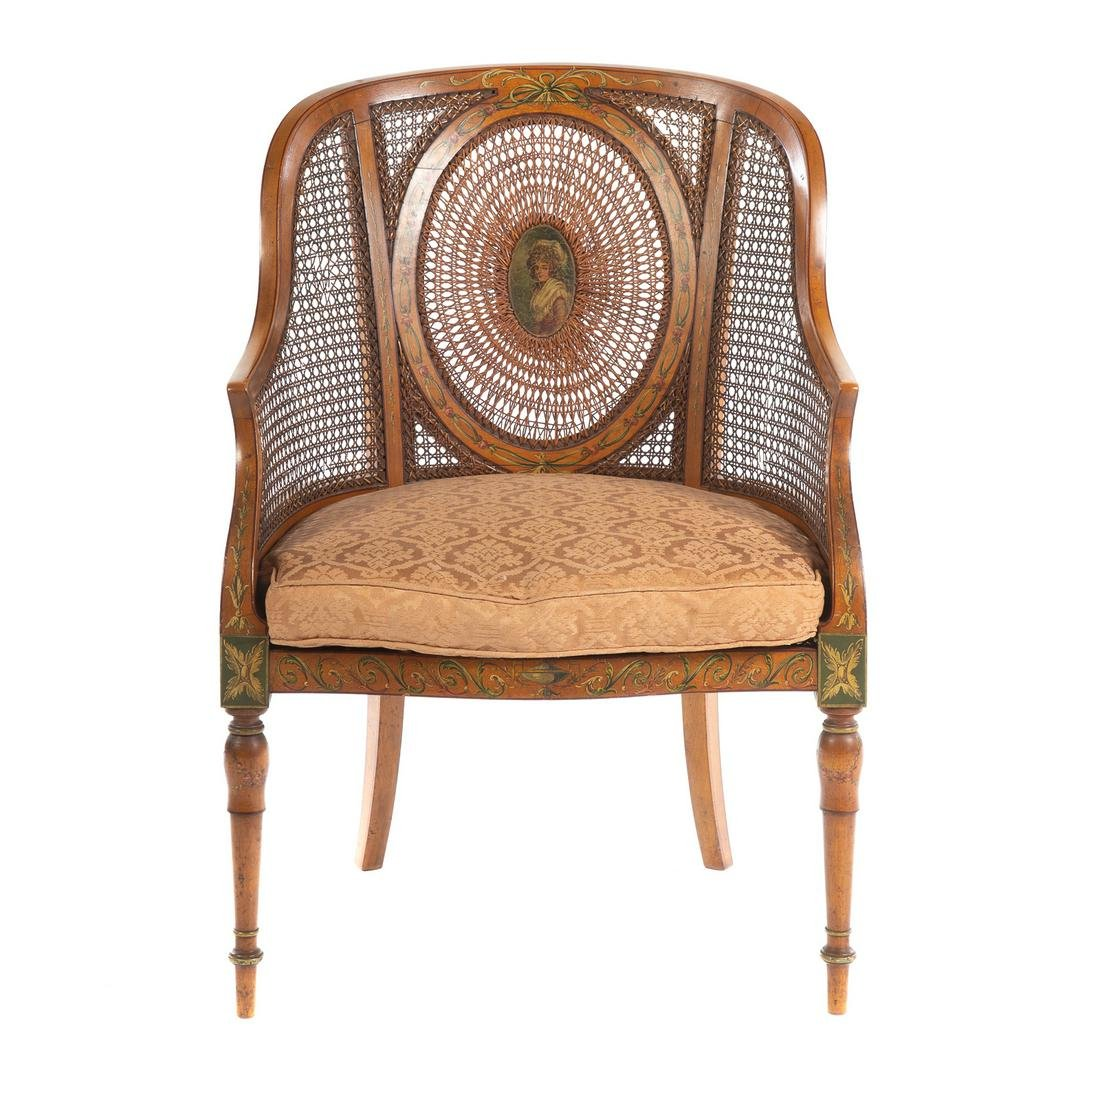 George III Adam Style Satinwood Arm Chair